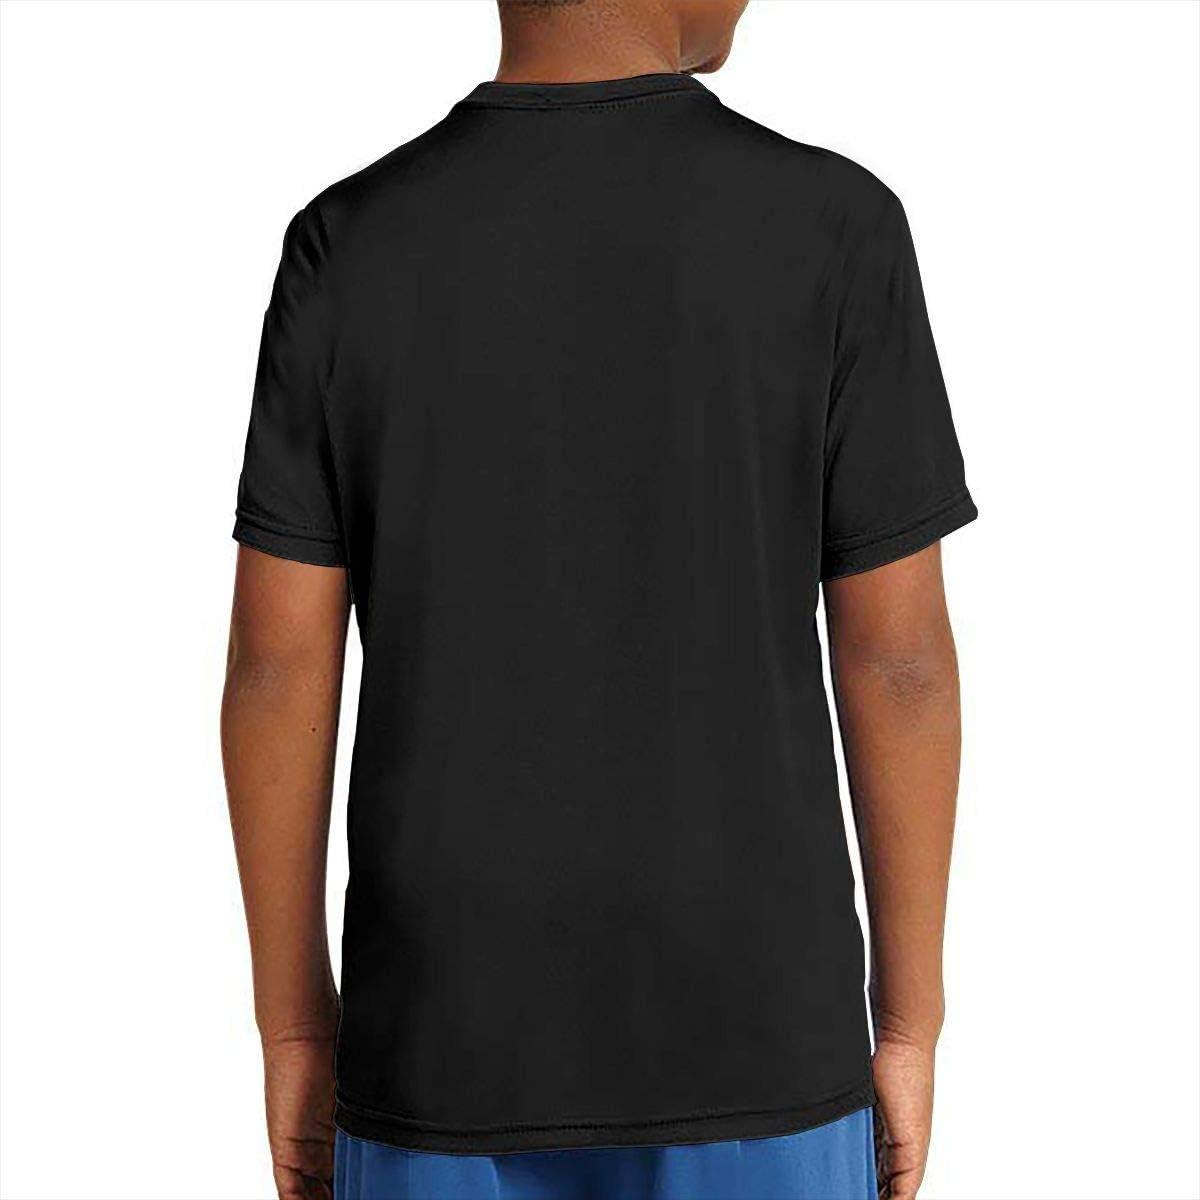 W/_WE Elimination Boys/&Girls Youth Tshirt Fashion 3D T-Shirt Short Sleeve Raglan Baseball Tee Black